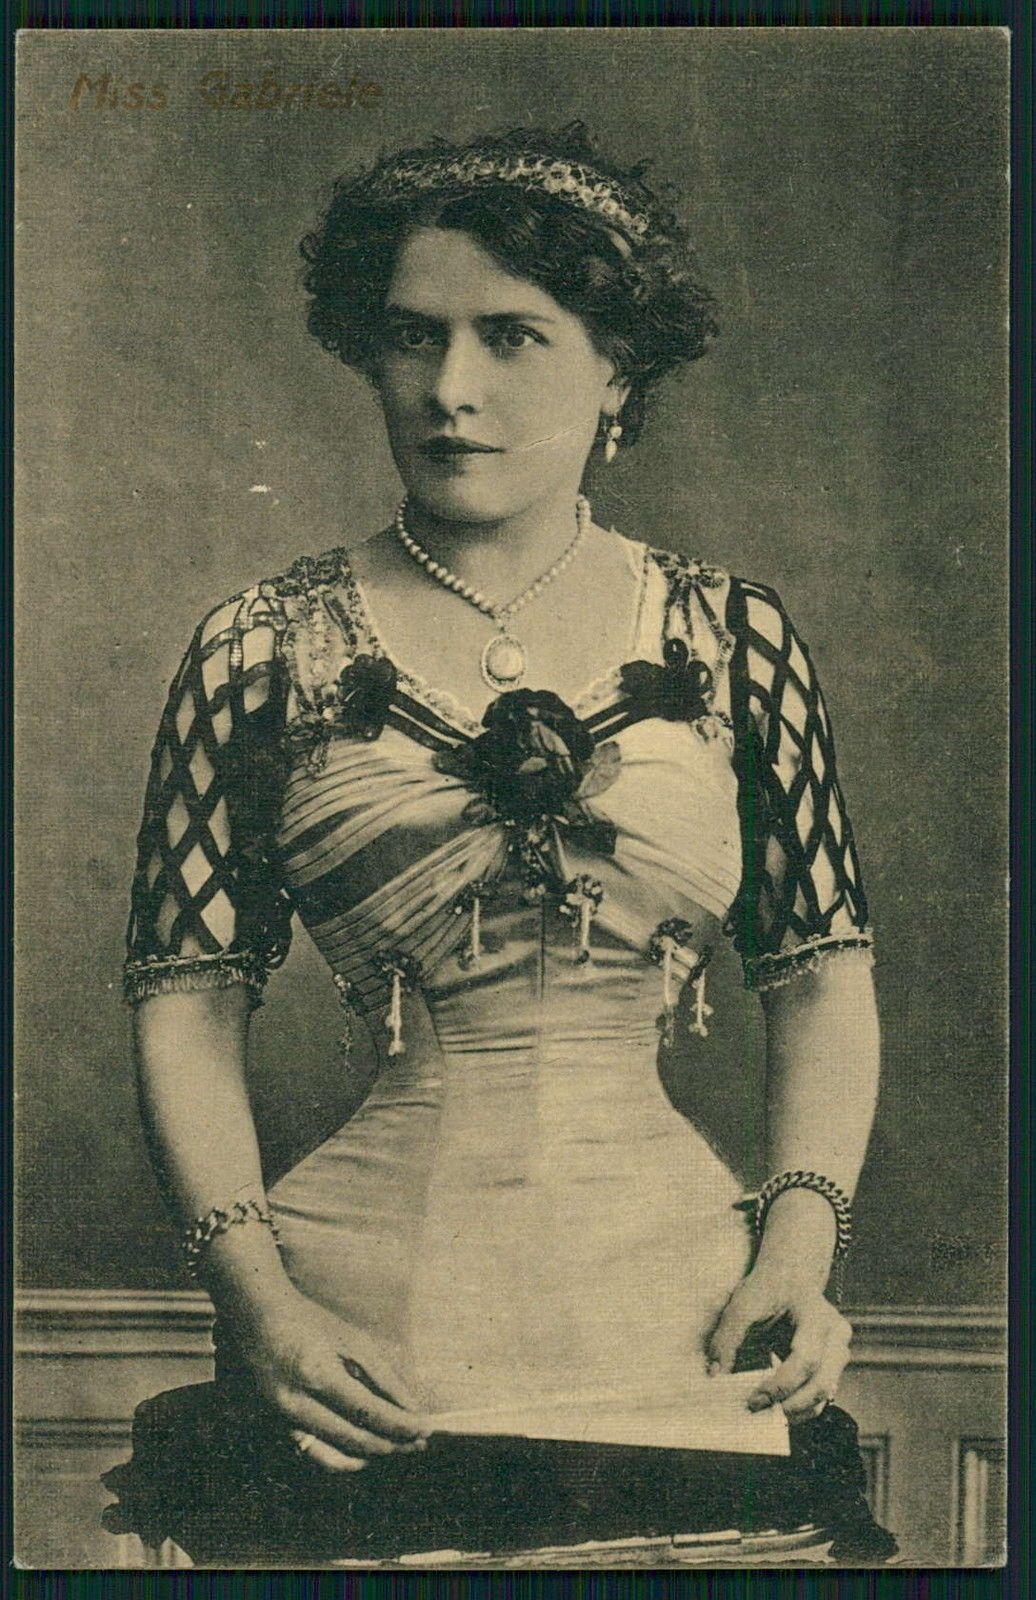 Circus Freak Half Woman Torso Only Luna Park Original Old 1920s